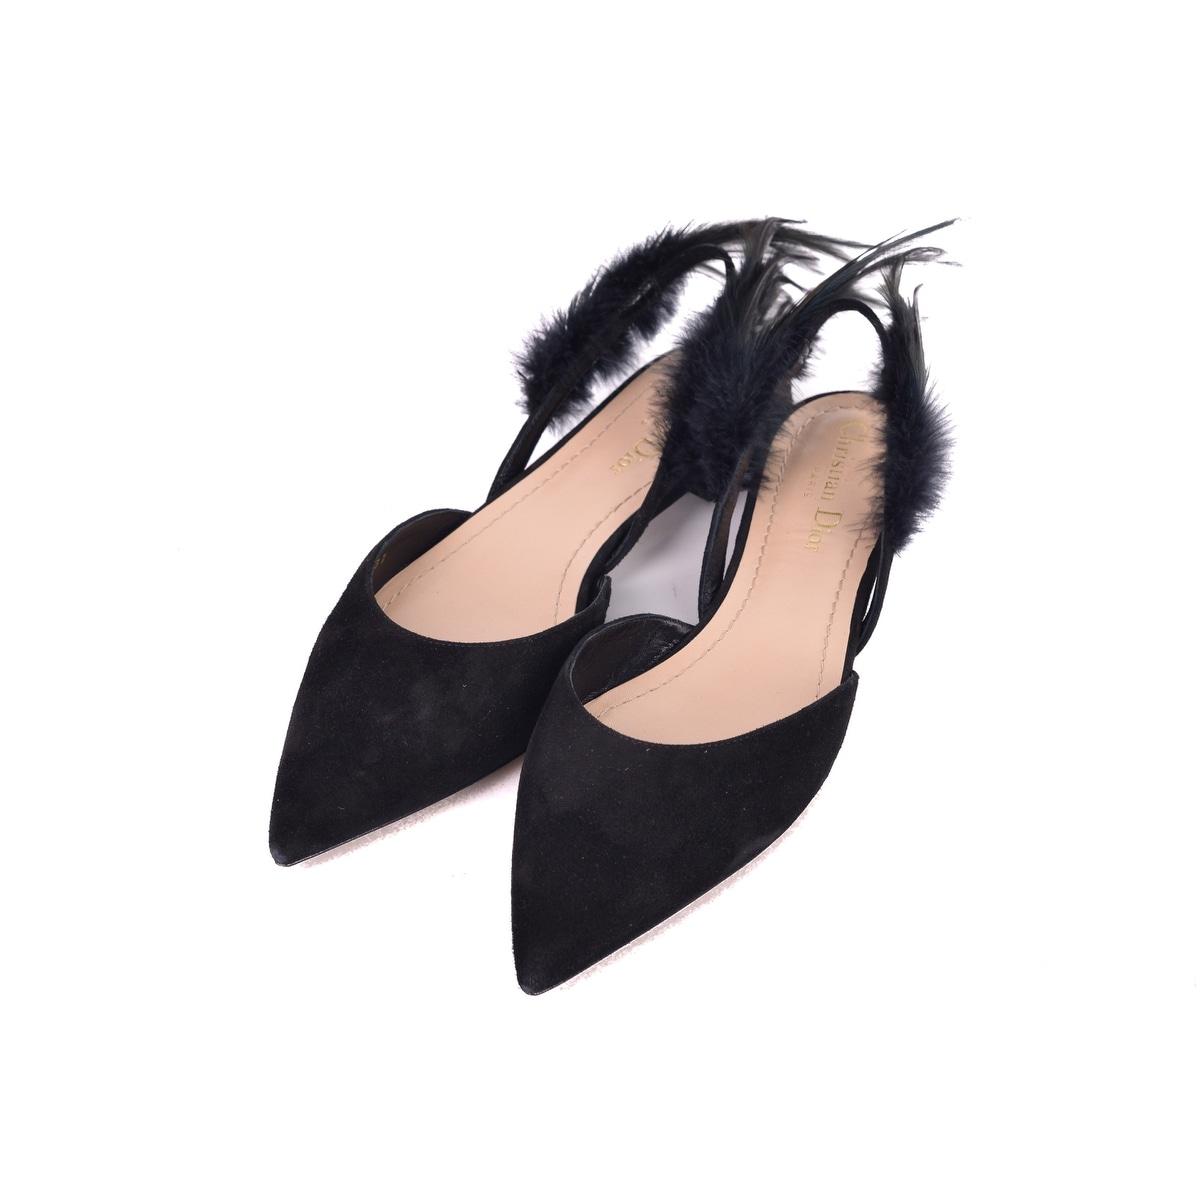 7613329a879 Dior Womens Black Suede Dior Ethnie Feather Flats